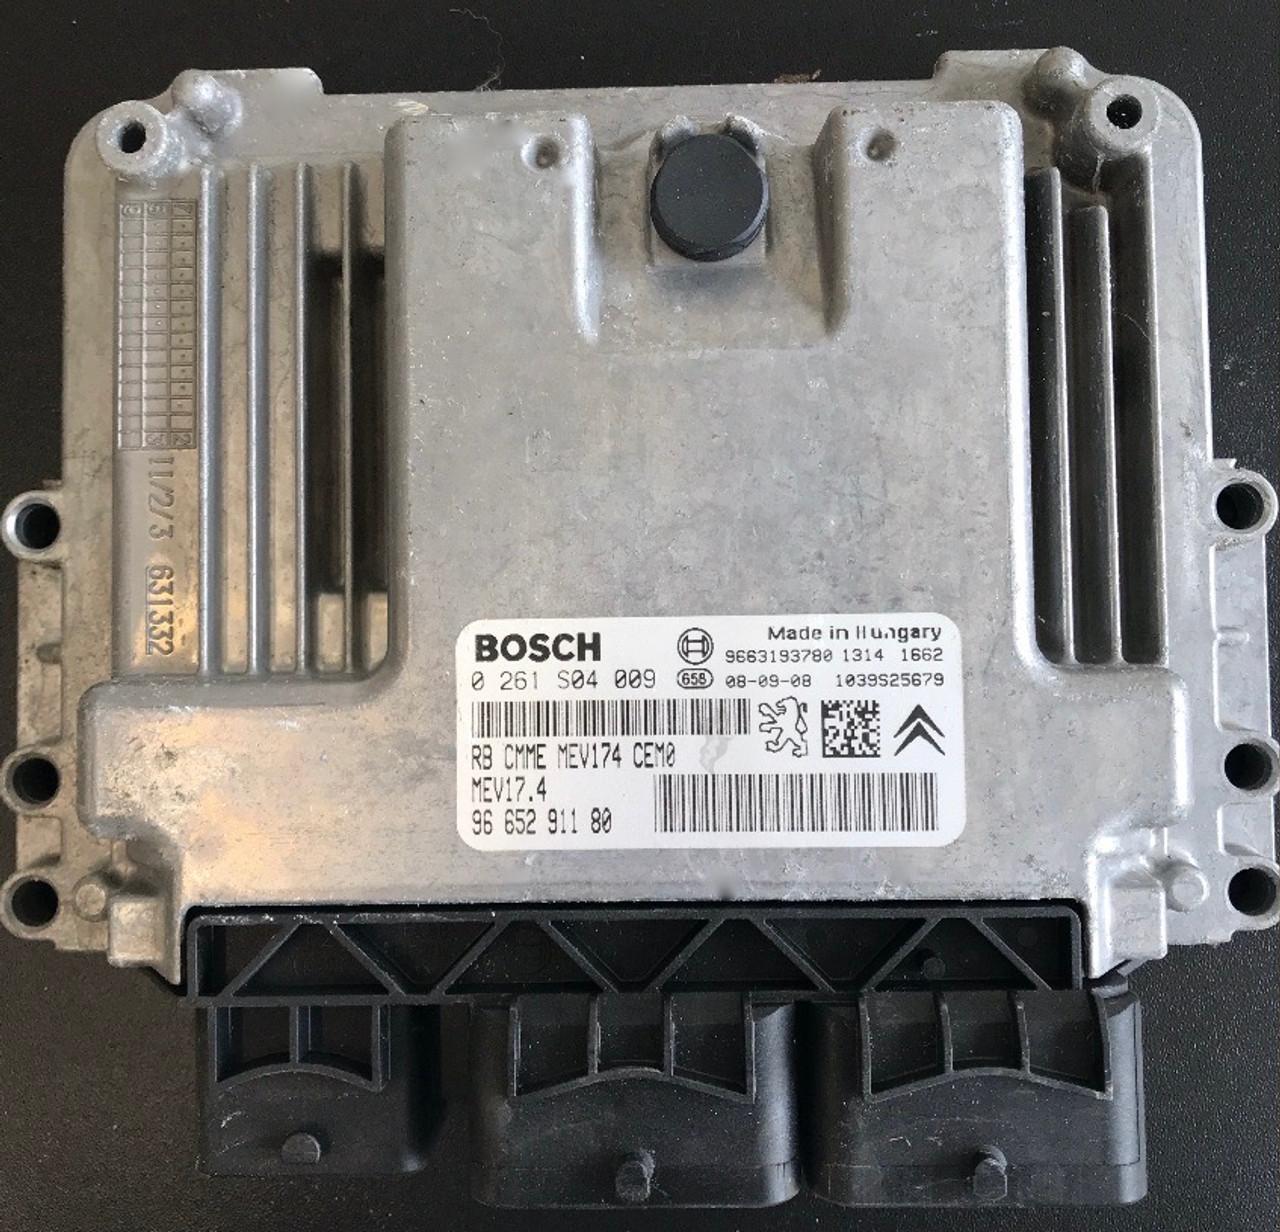 Bosch Engine ECU, Peugeot 207 1.4, 0261S04009, 0 261 S04 009, 9665291180, 96 652 911 80, MEV17.4, 1039S25679